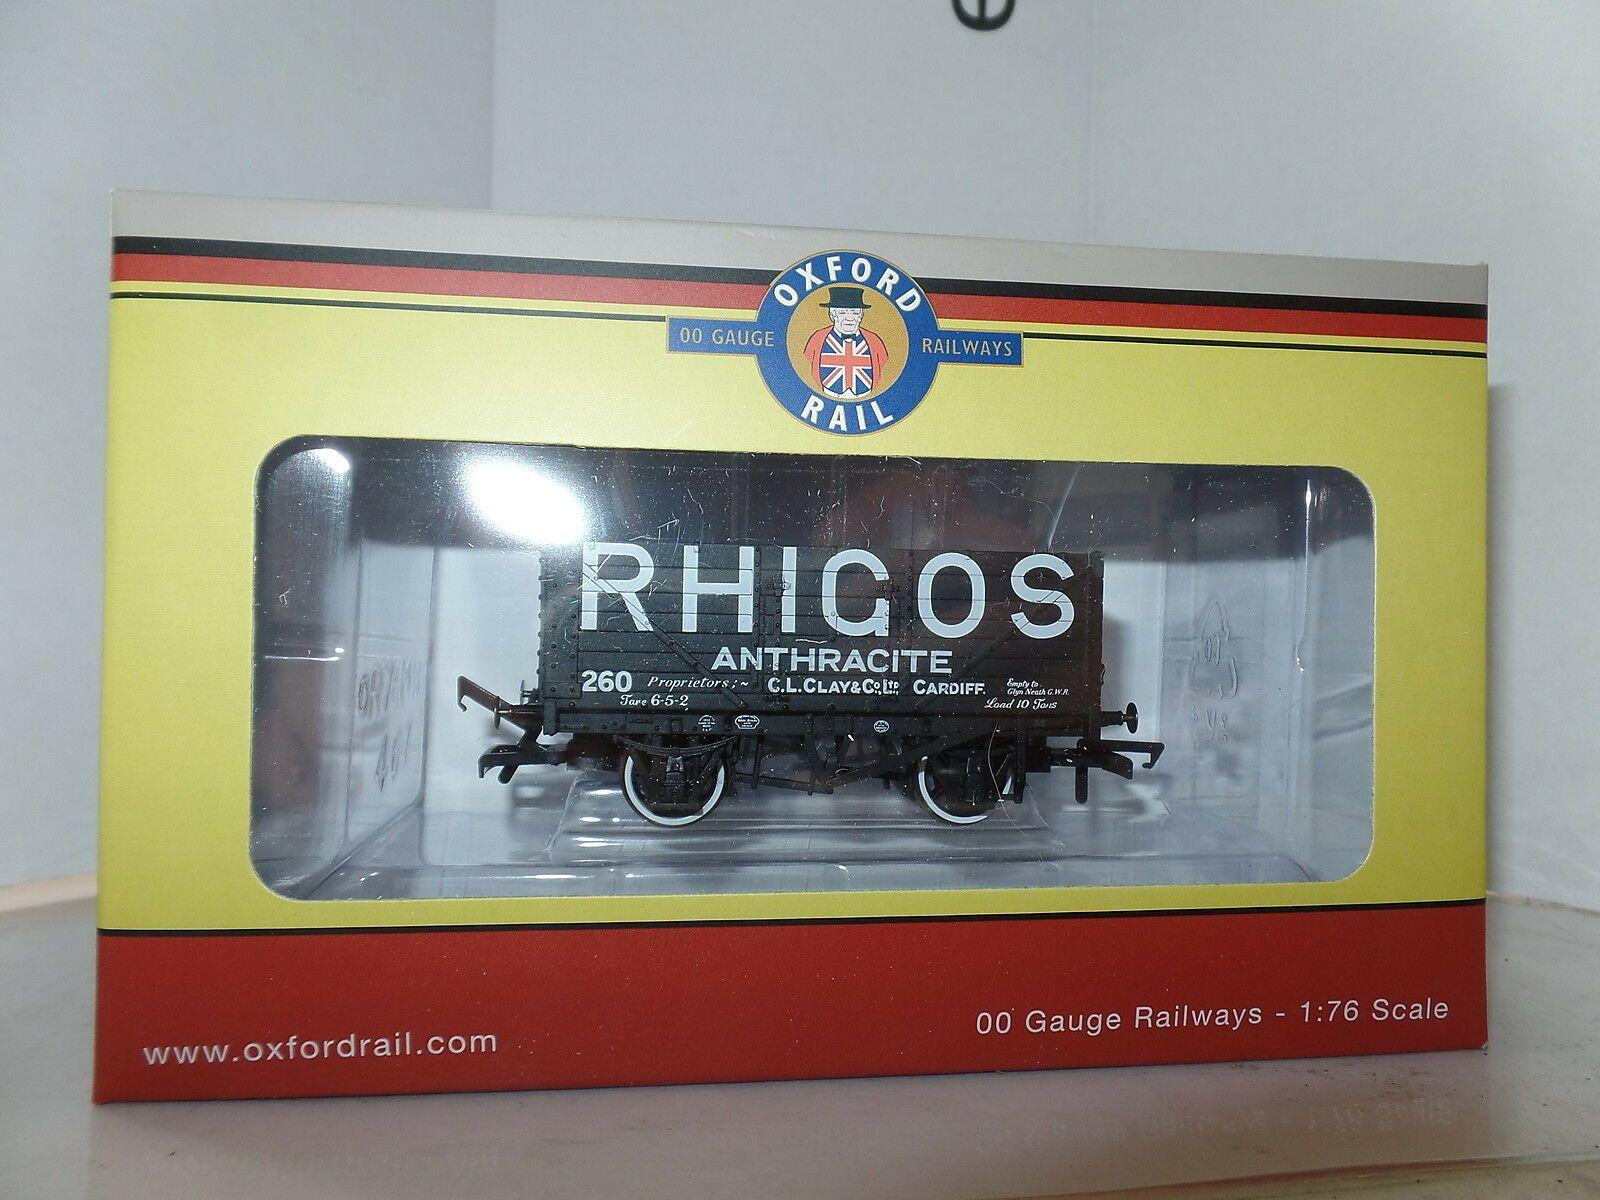 Oxford Rail OR76MW7025-7 Plank Mineral Wagon Rhigos Anthracite Cardiff